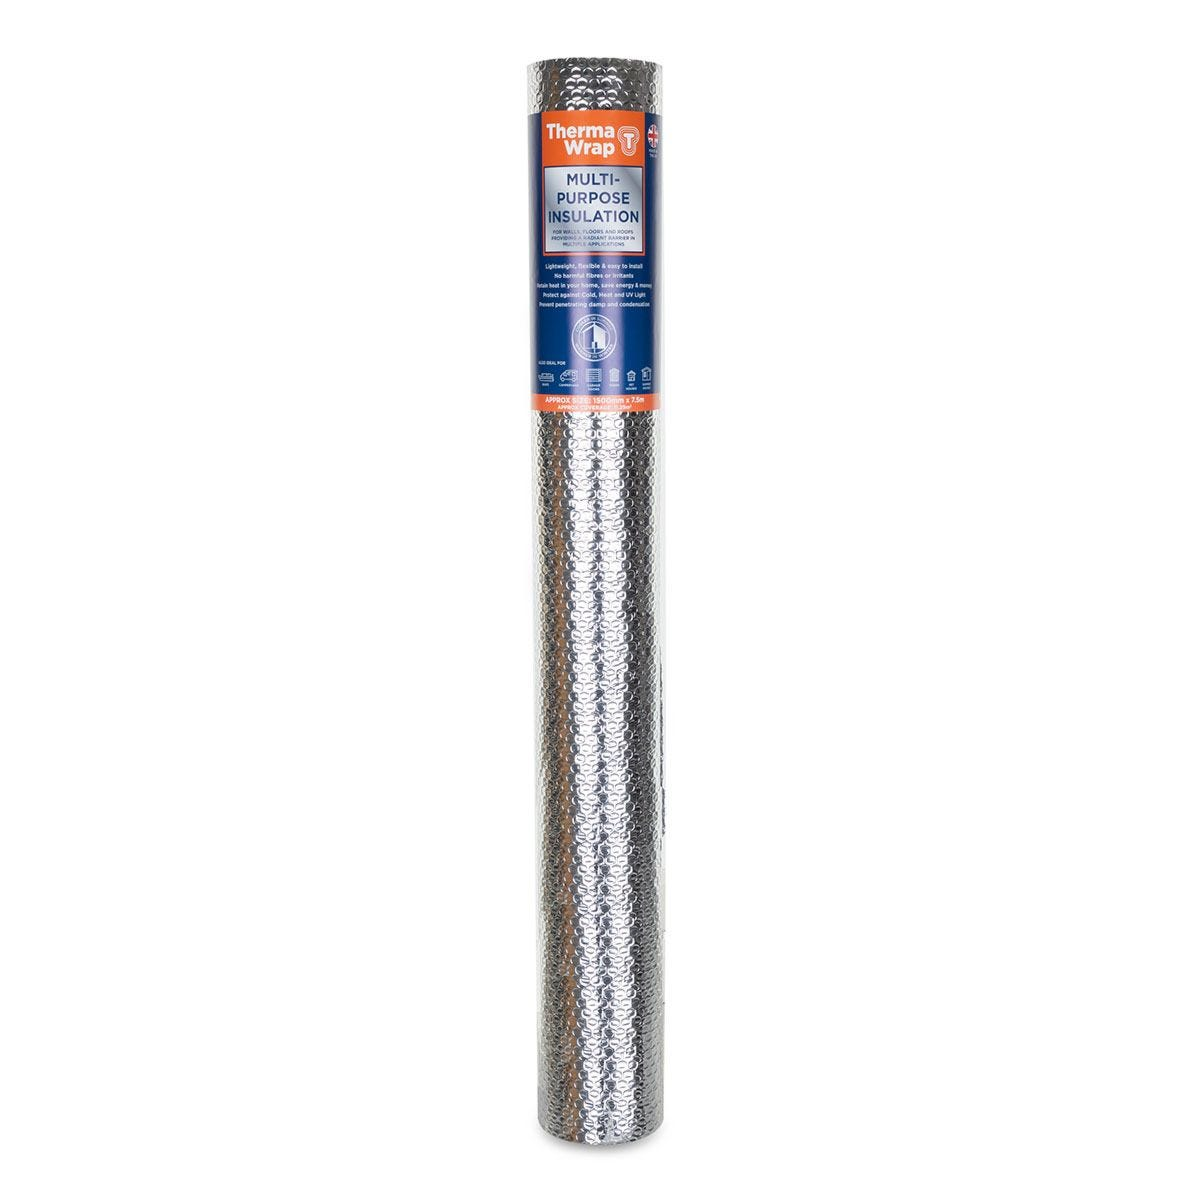 Thermawrap Multi-Purpose Insulation 7.5m x 1500mm